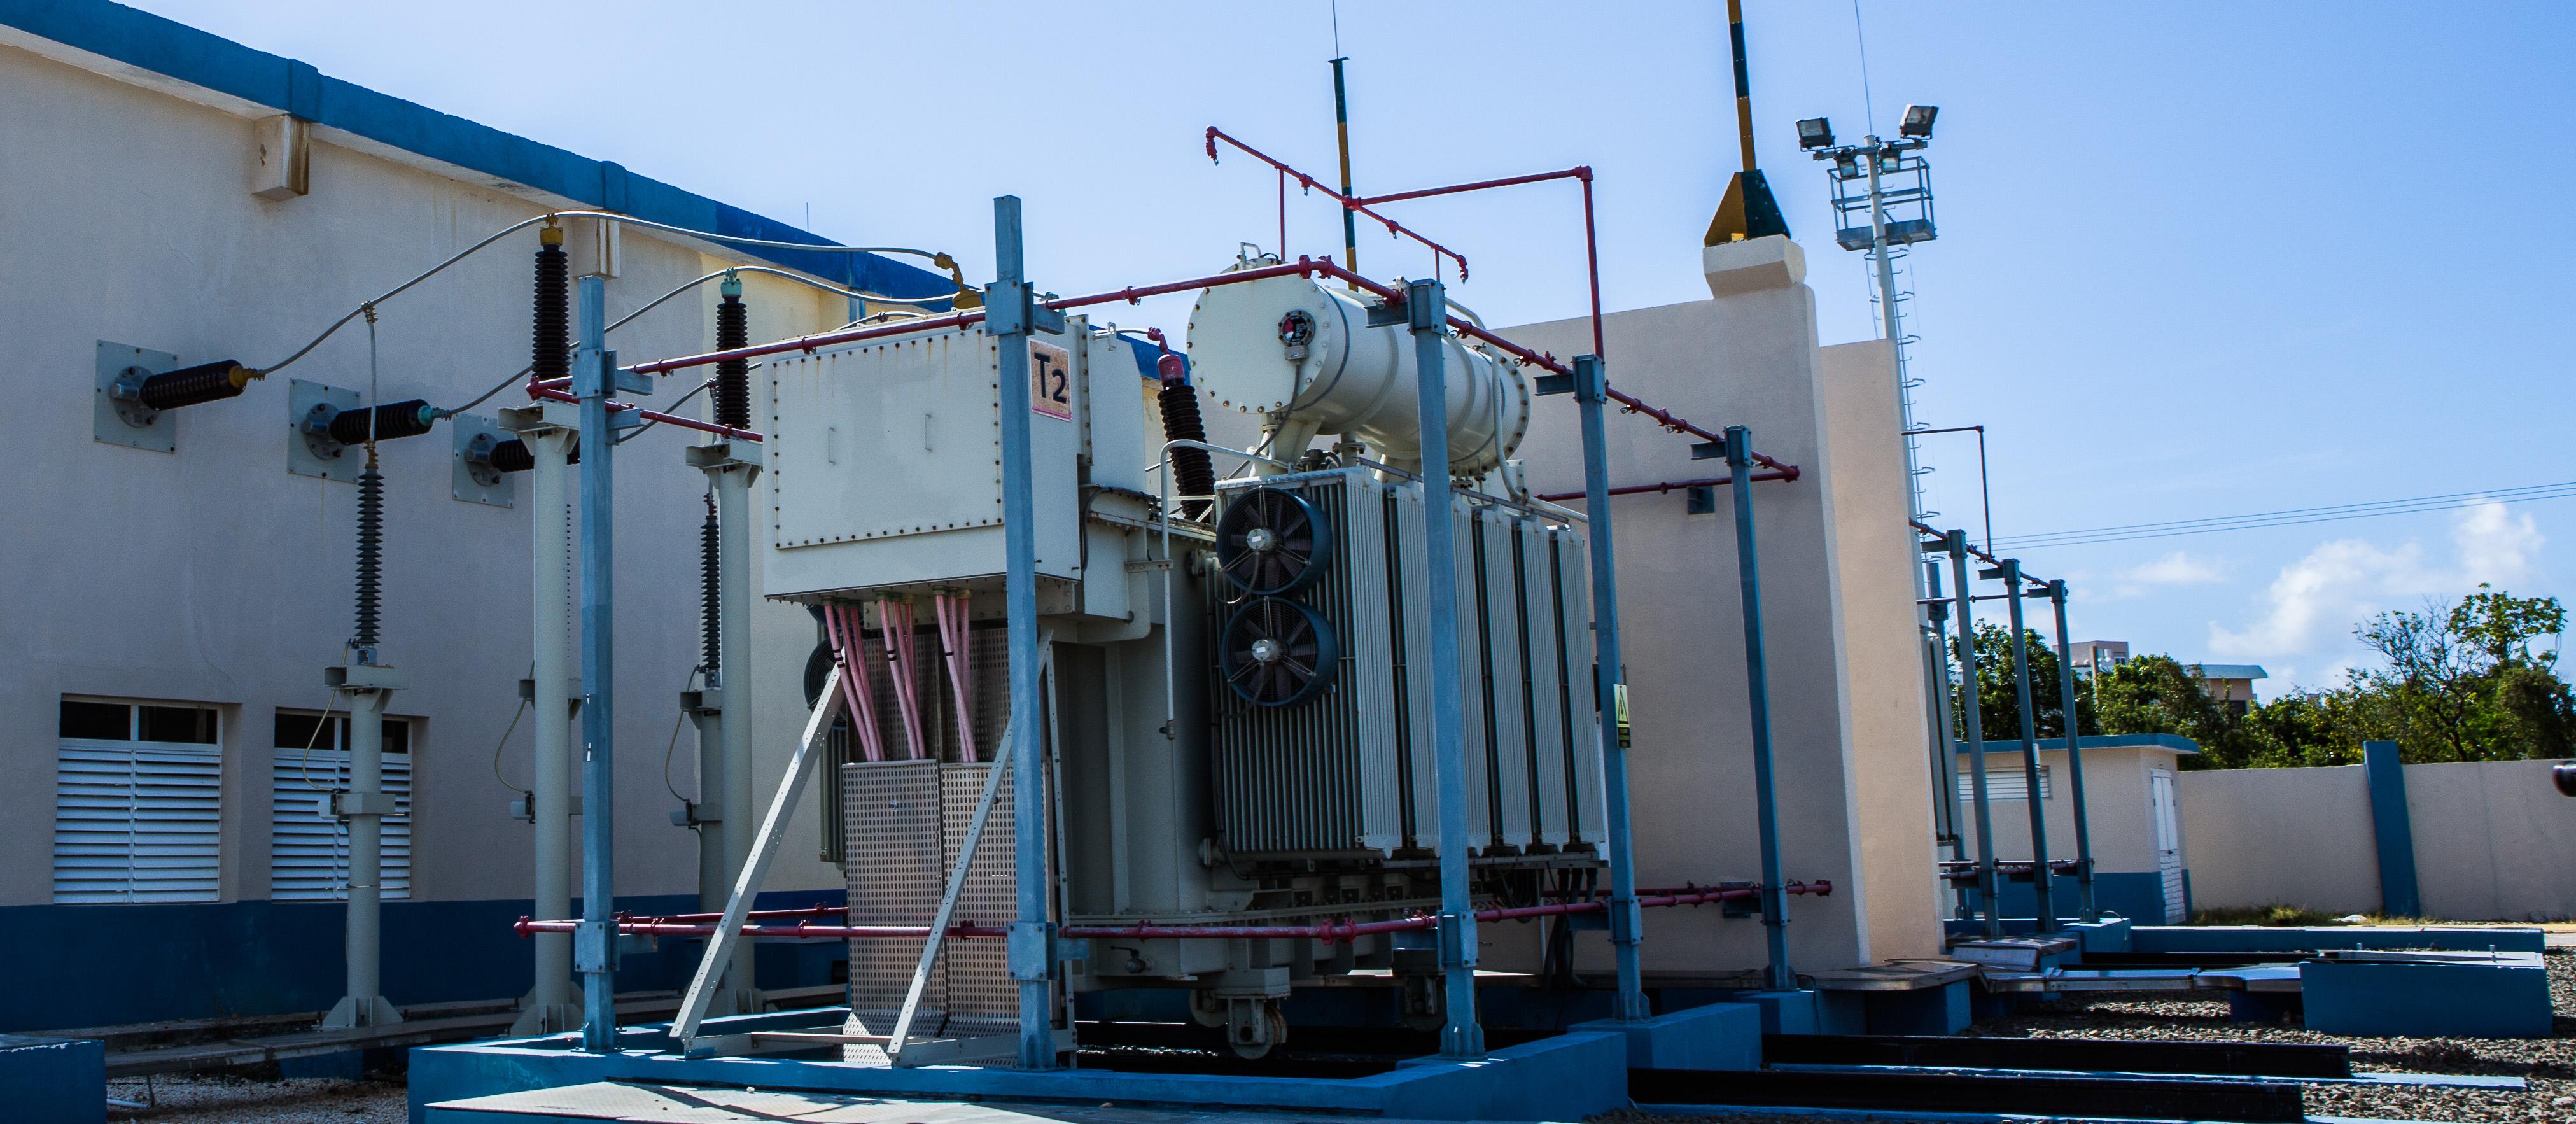 Subestación Electrica de alta tensión AT